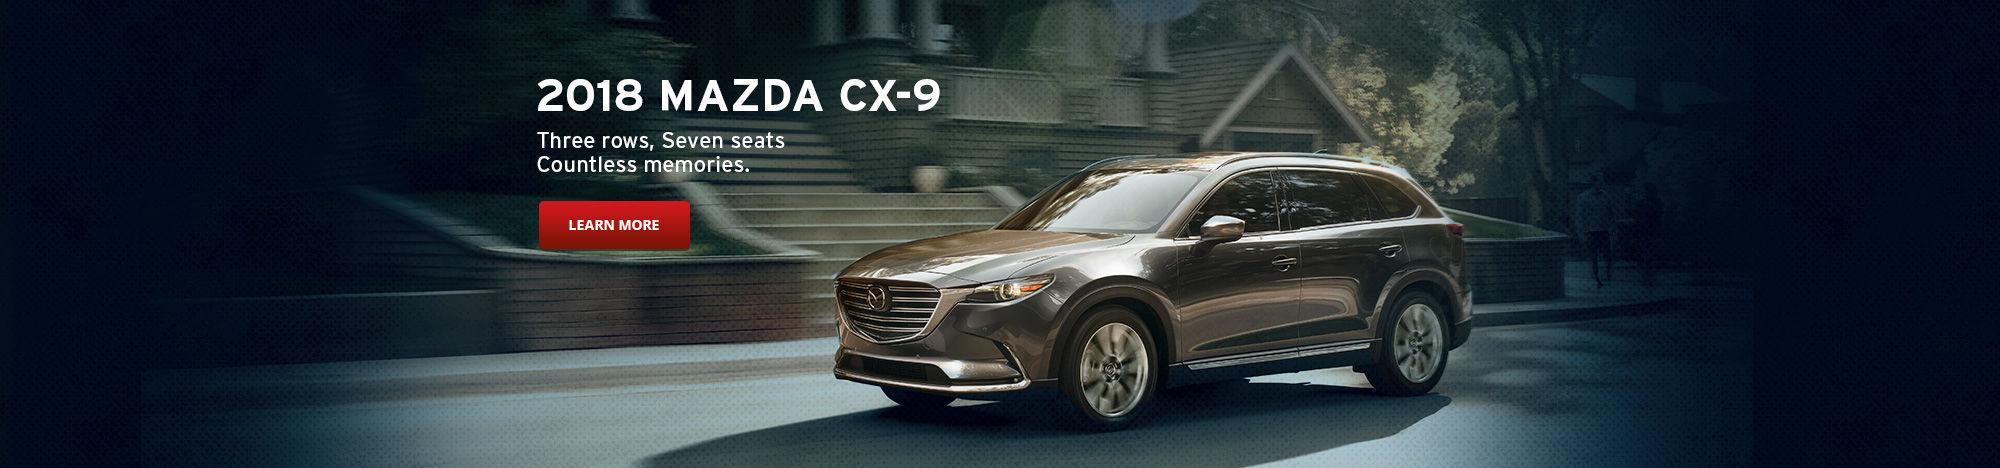 2018 CX-9